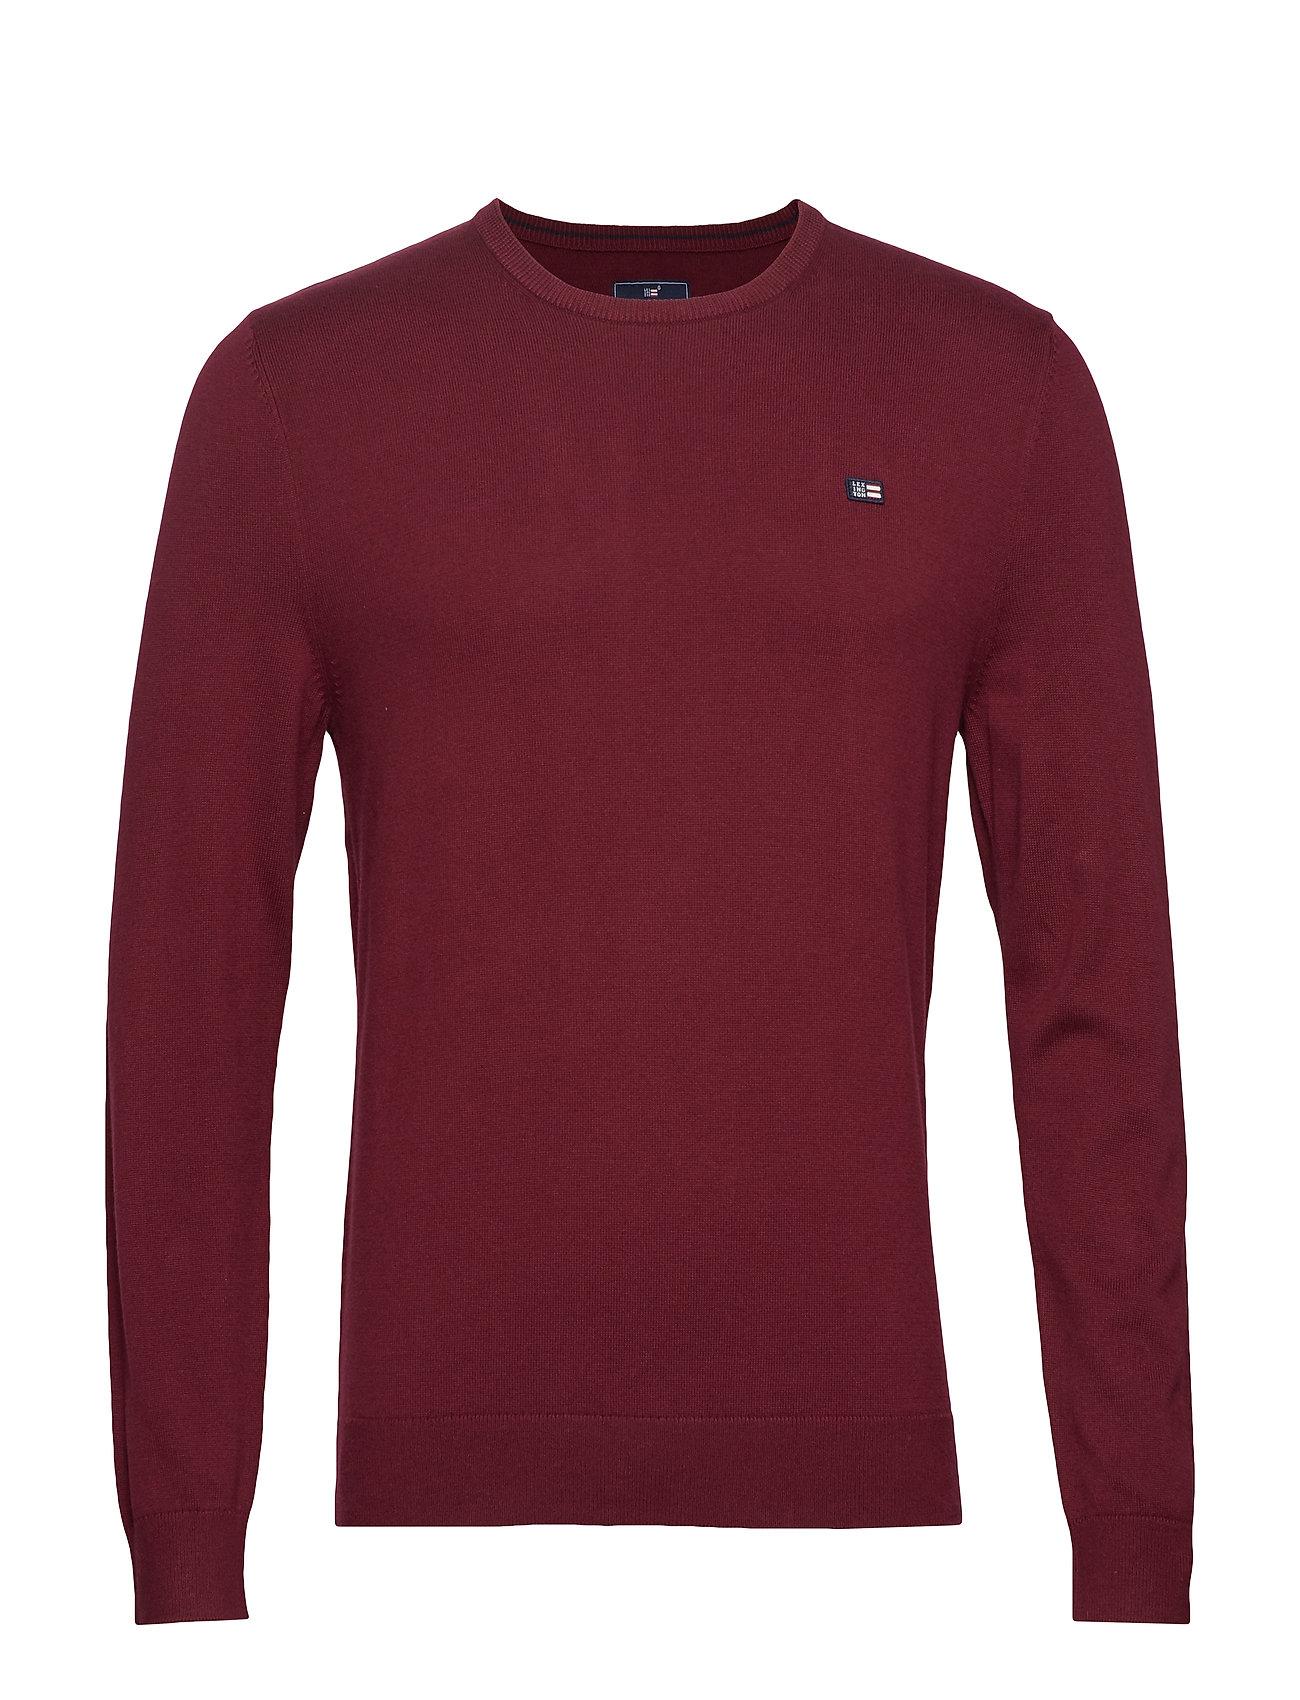 Lexington Clothing Bradley Crew Neck Sweater - DARK RED